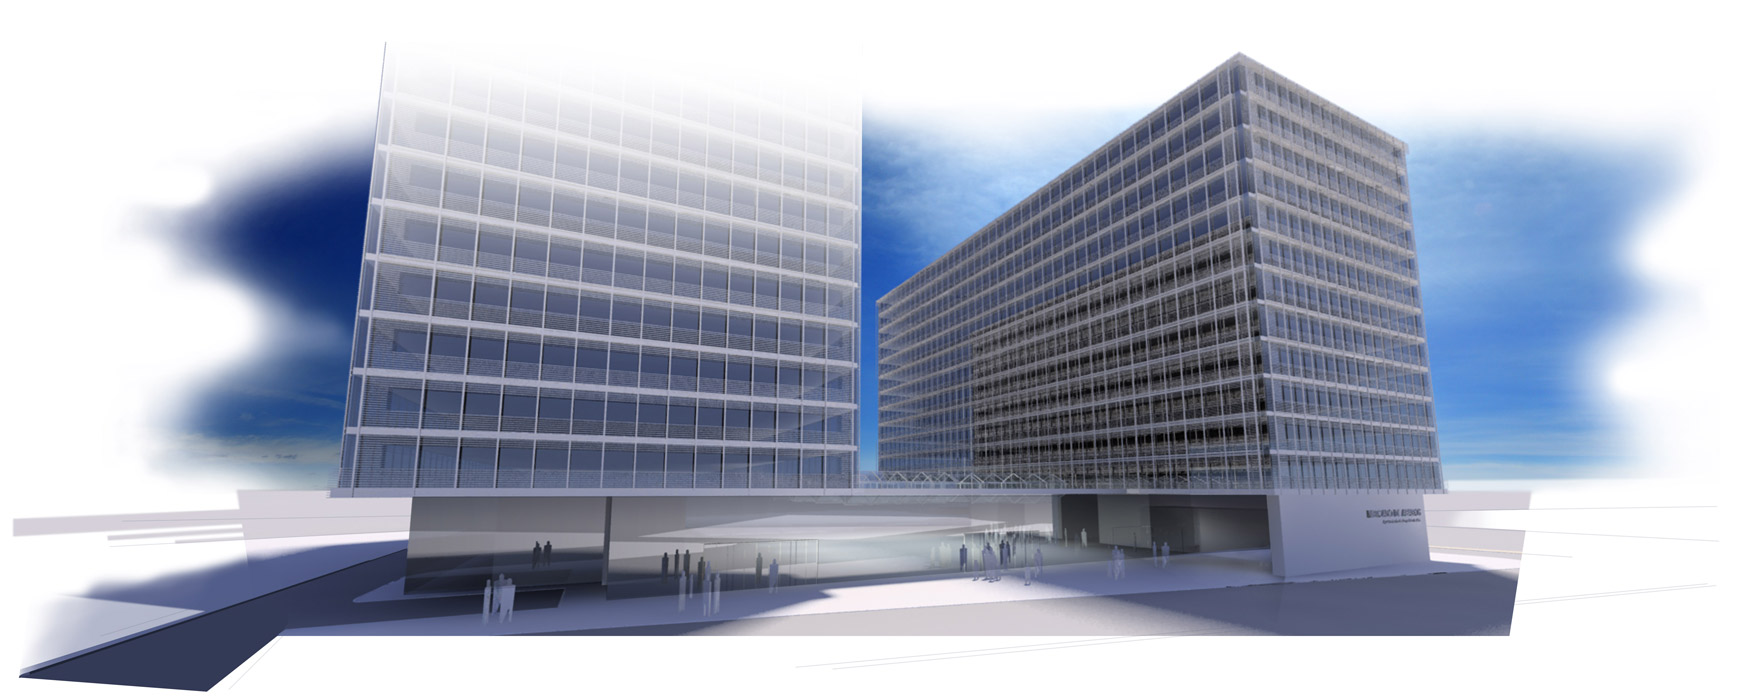 concurso de arquitectura exterior 3d